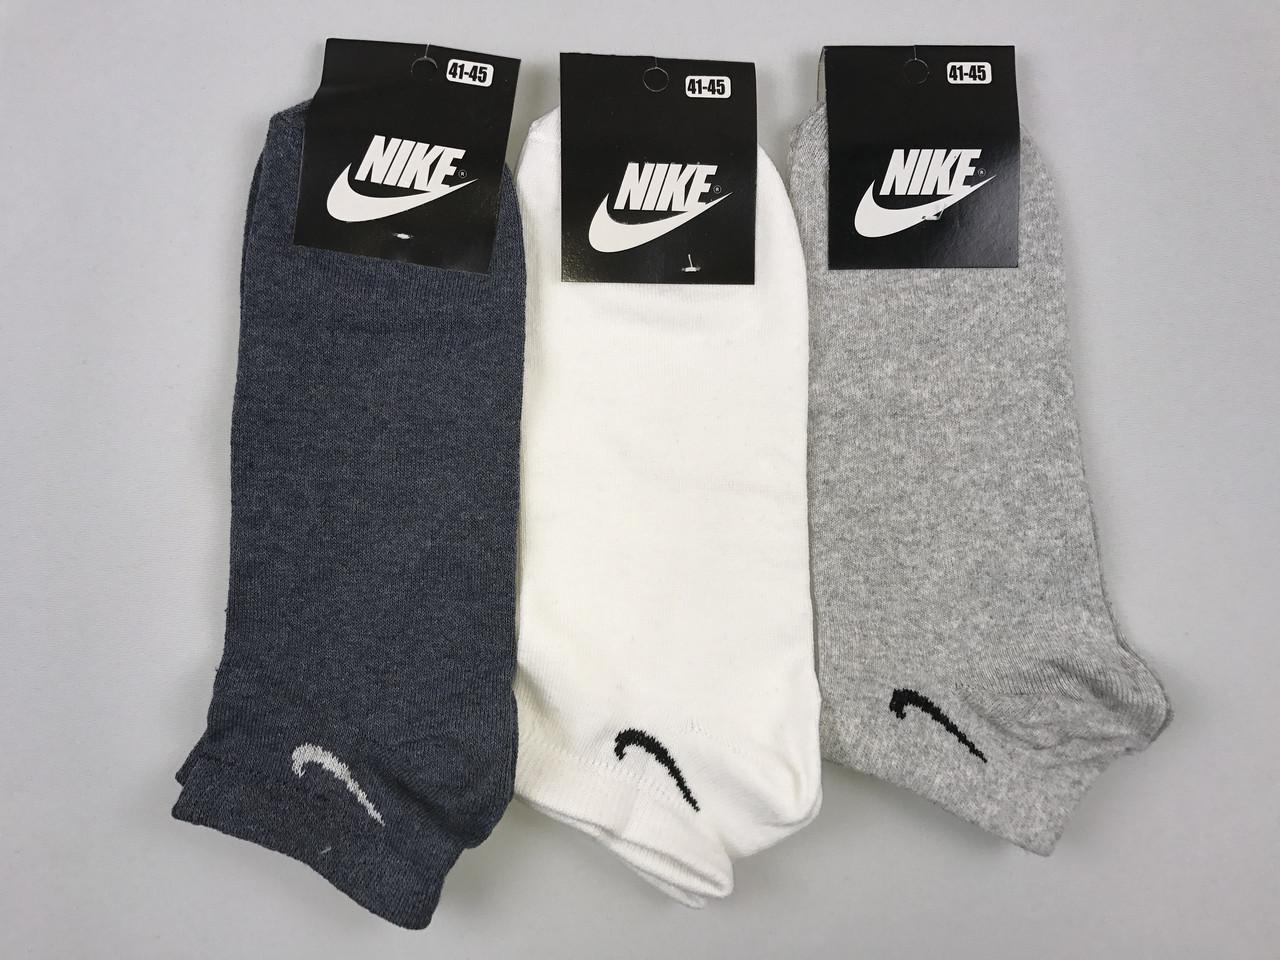 Носки мужские Nike реплика 41-45 Хлопок (12 пар) короткие